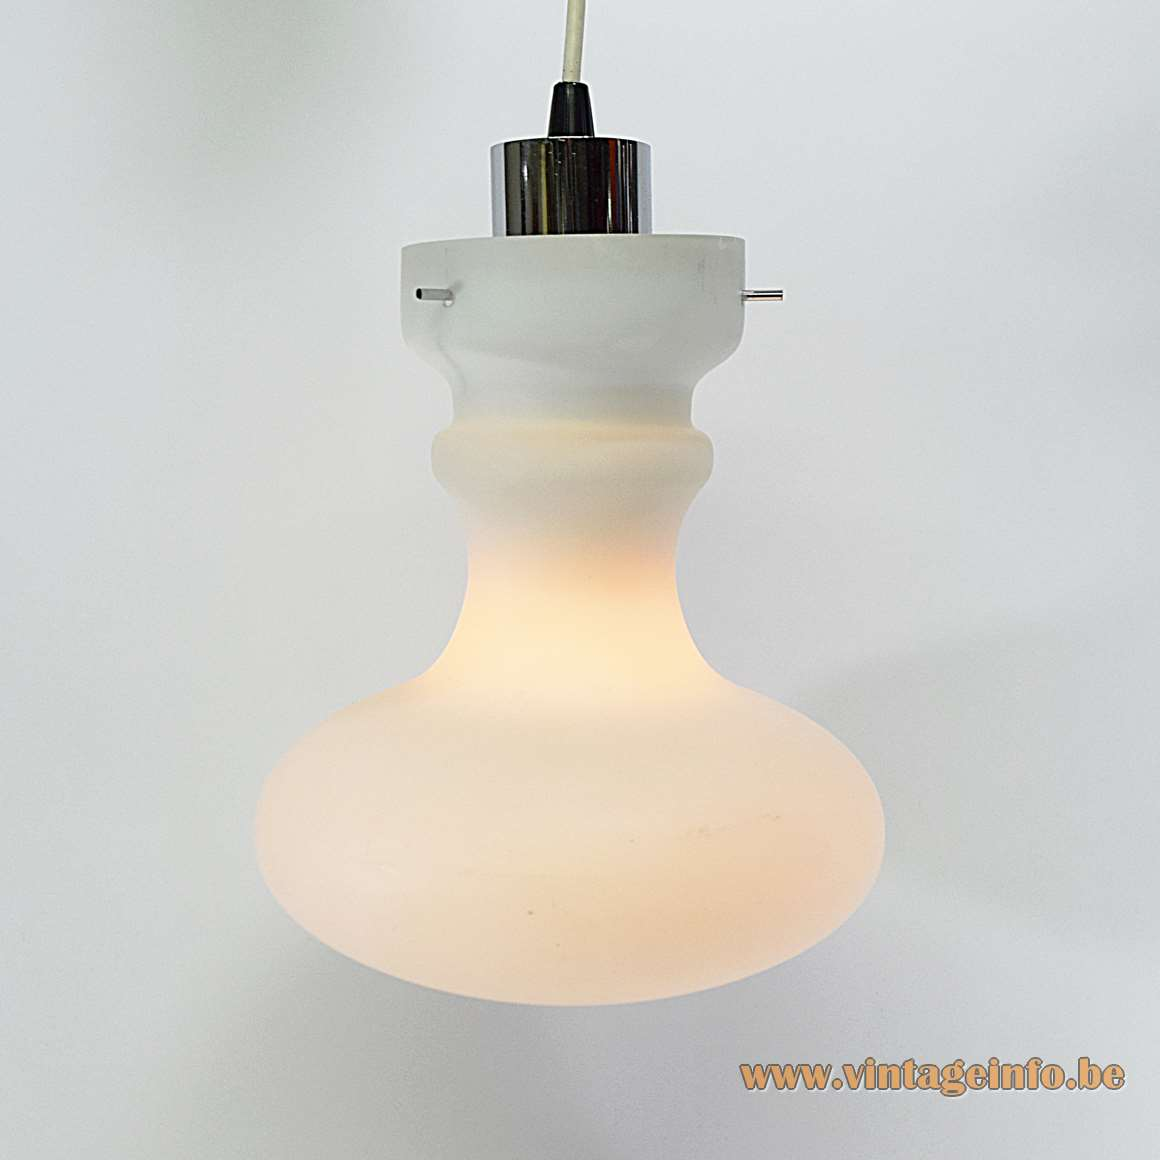 1970s Opal & Purple Pendant Lamp white glass acrylic lampshade chrome lampholder Massive 1960s MCM